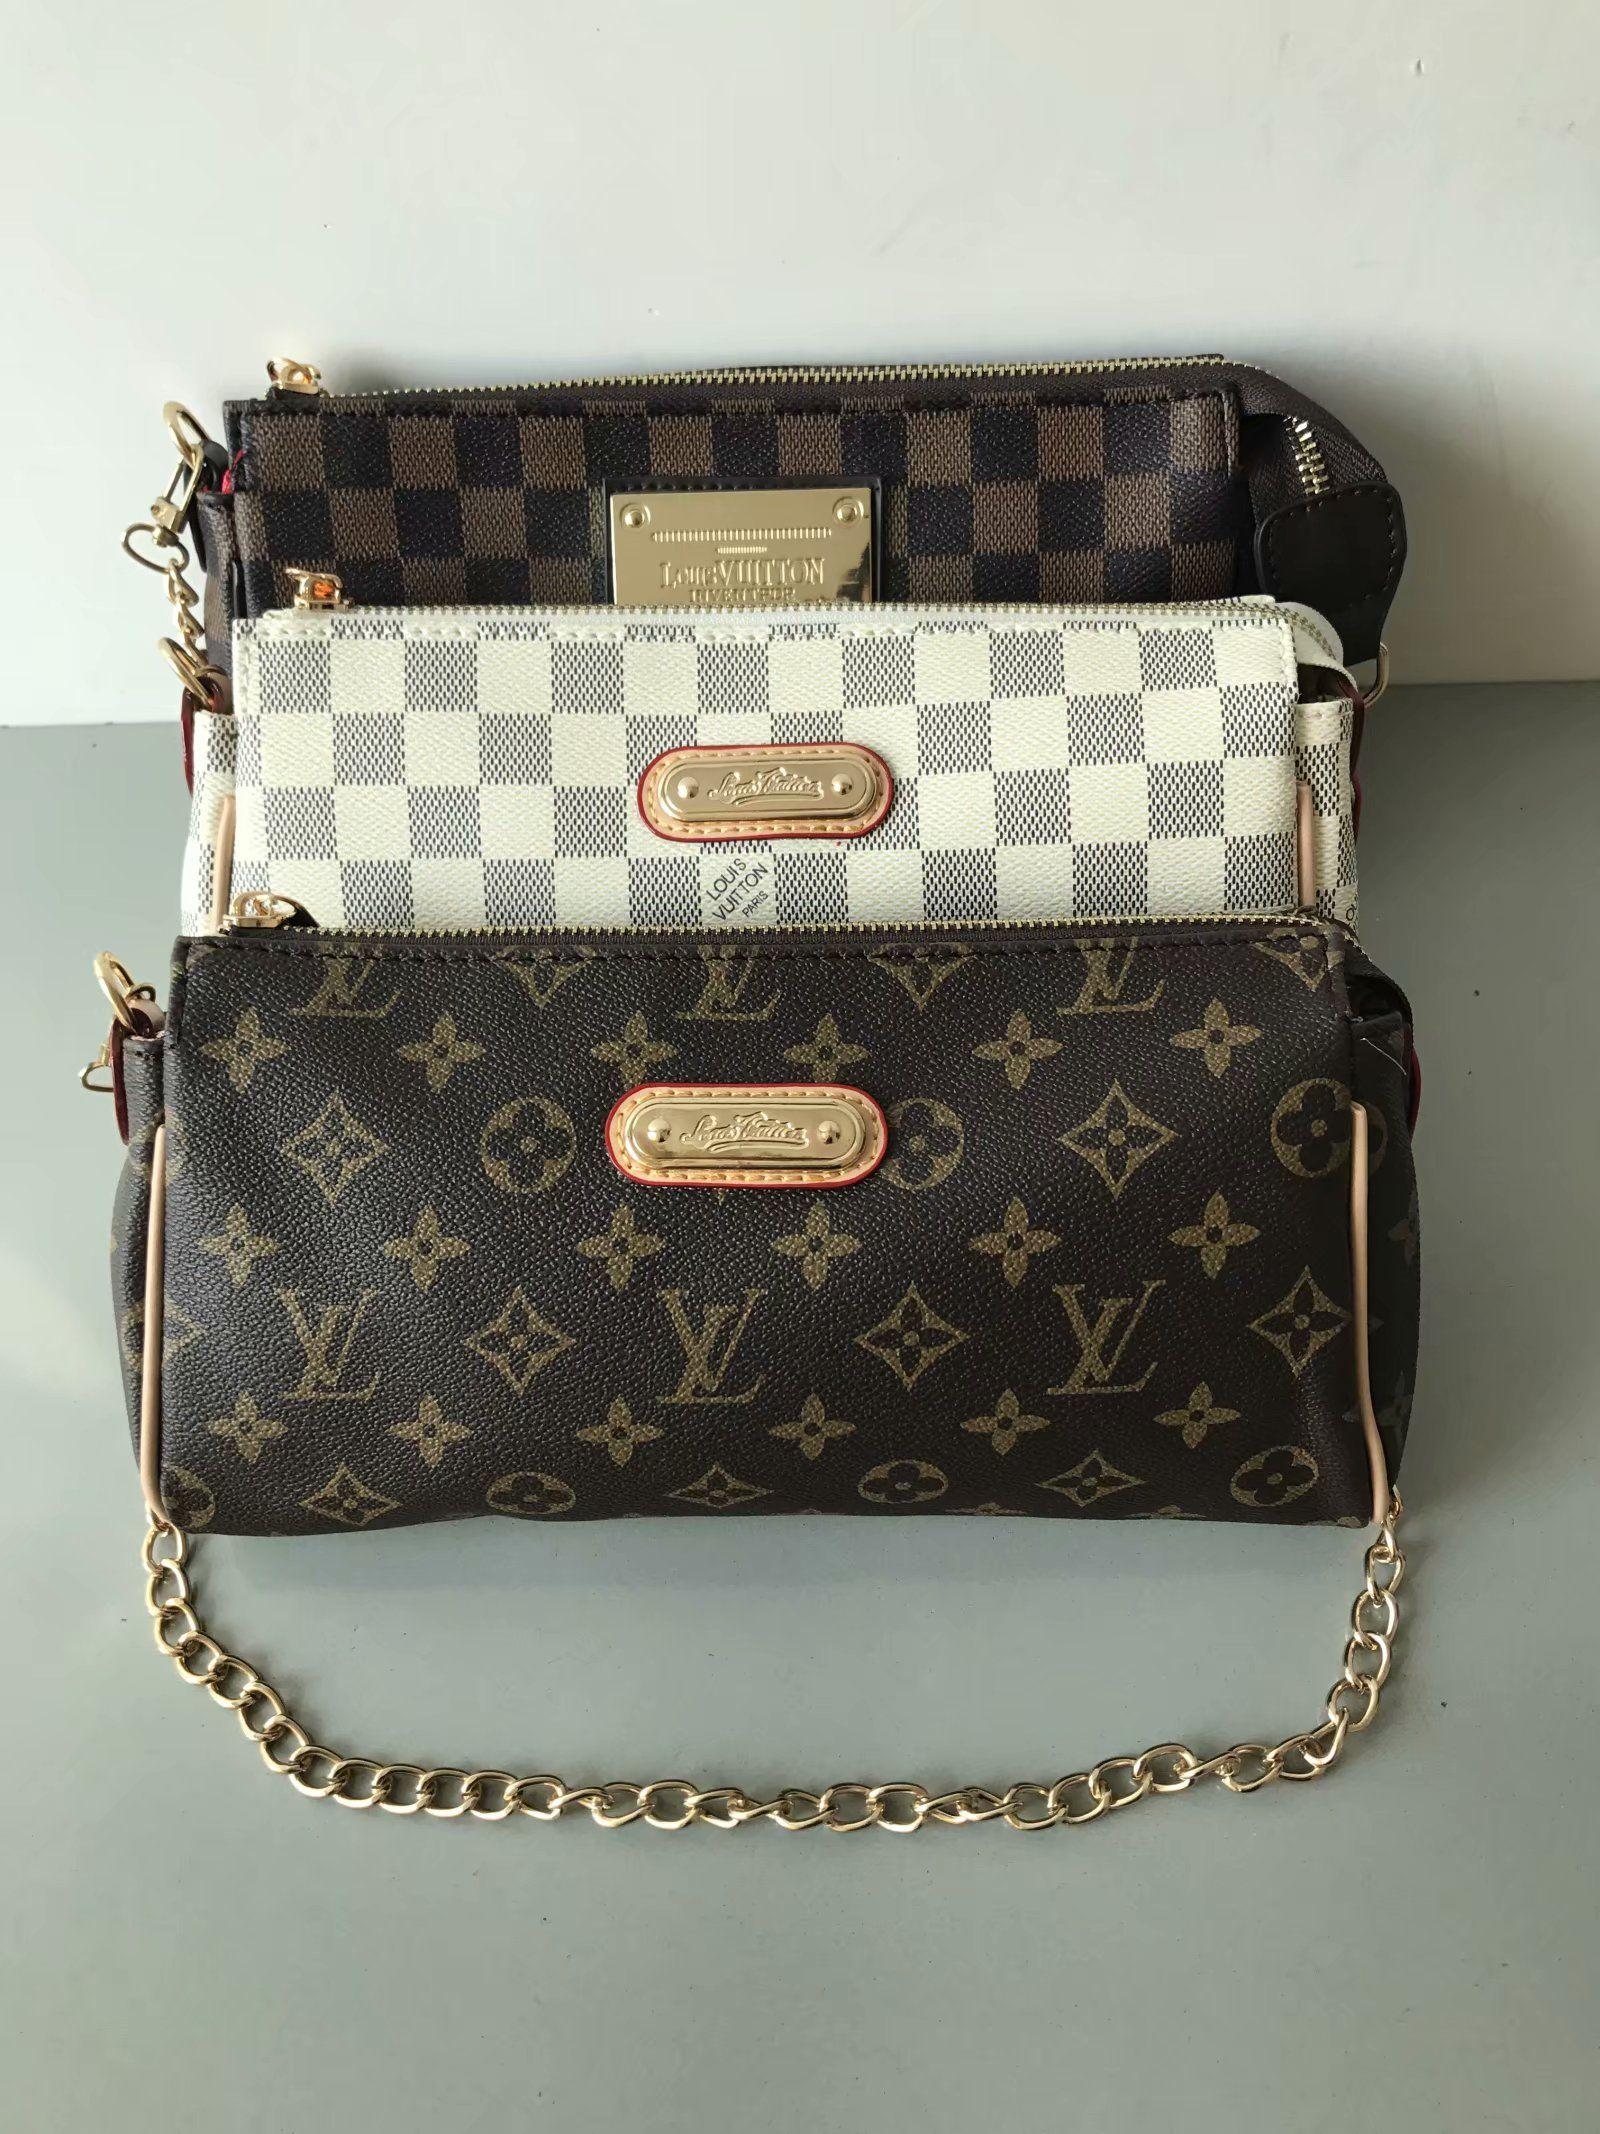 2018 New Hot Europe 2017 Luxury Brand Women Bags Handbag Famous ... cbf4f9aecc87a